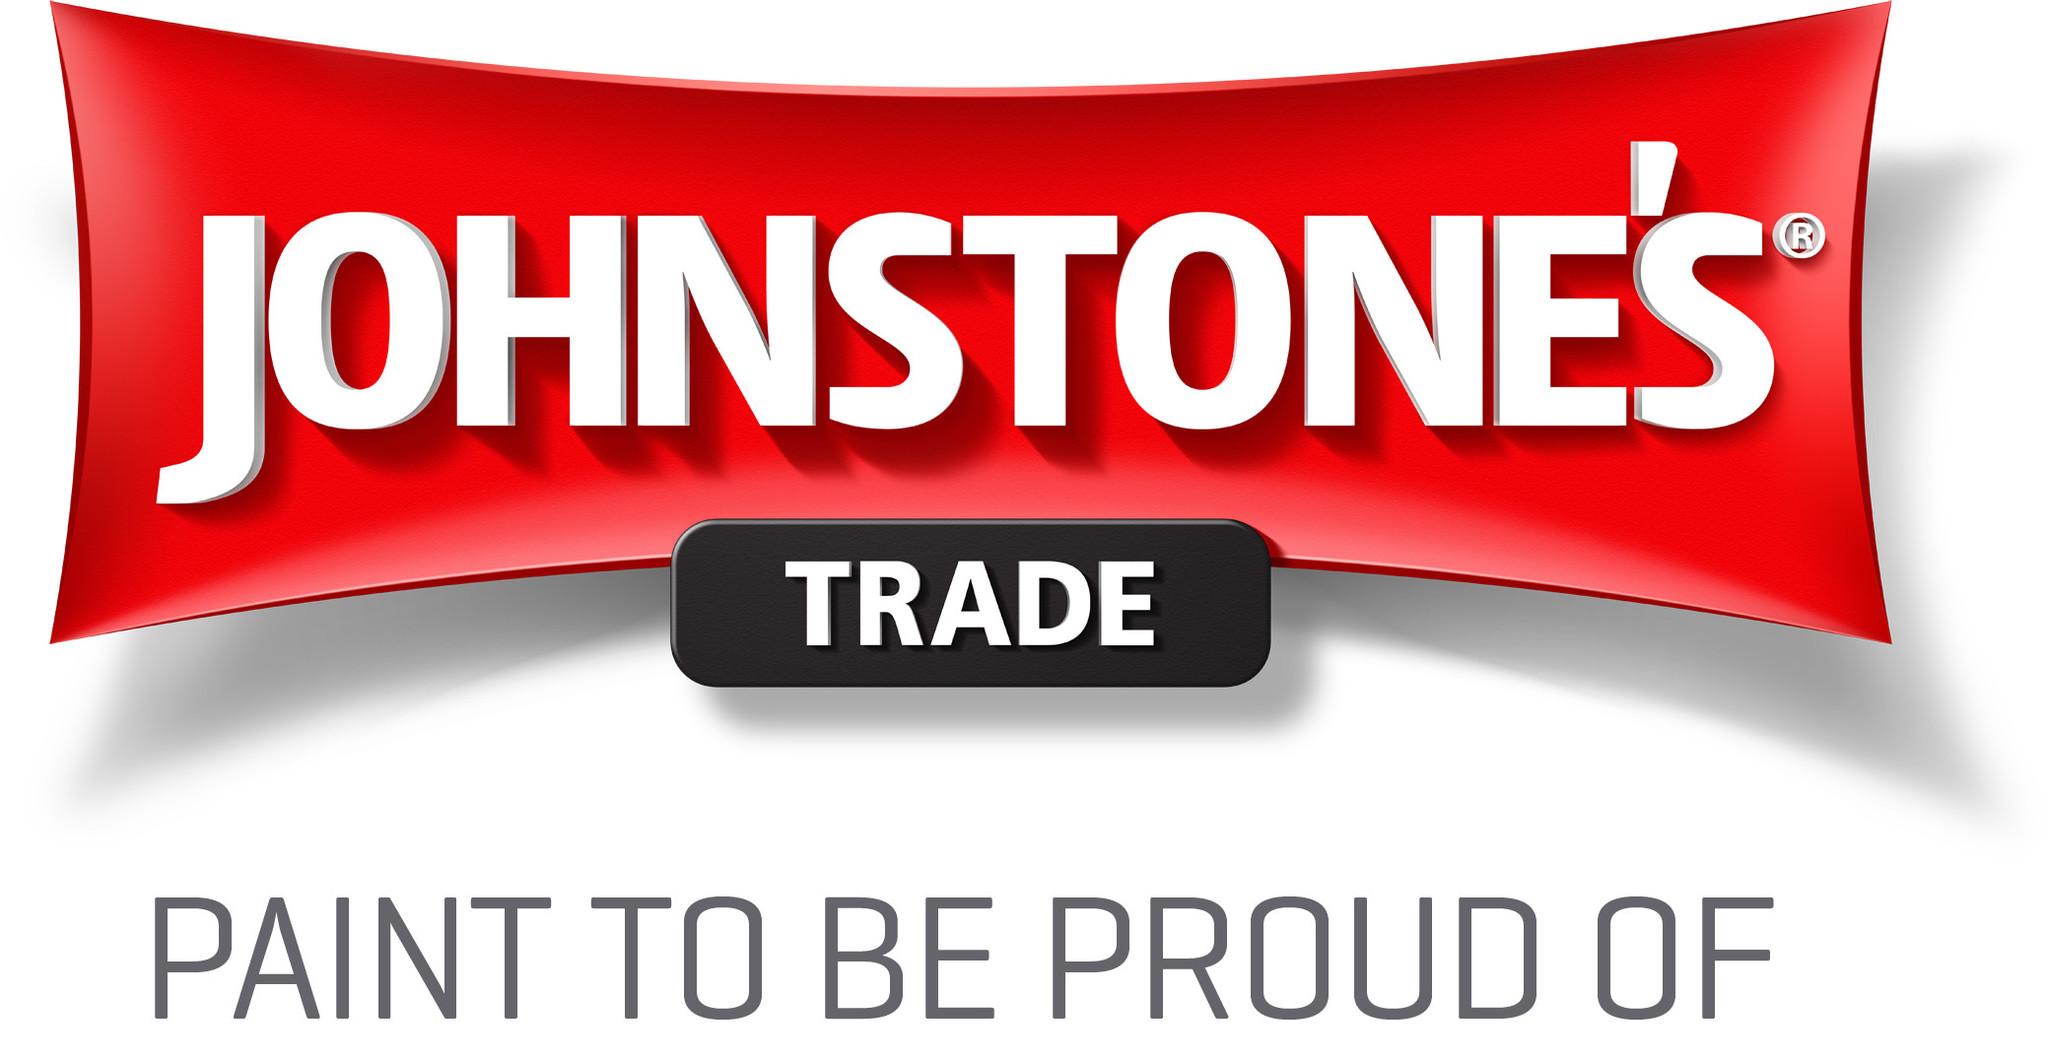 JOHNSTONE'S